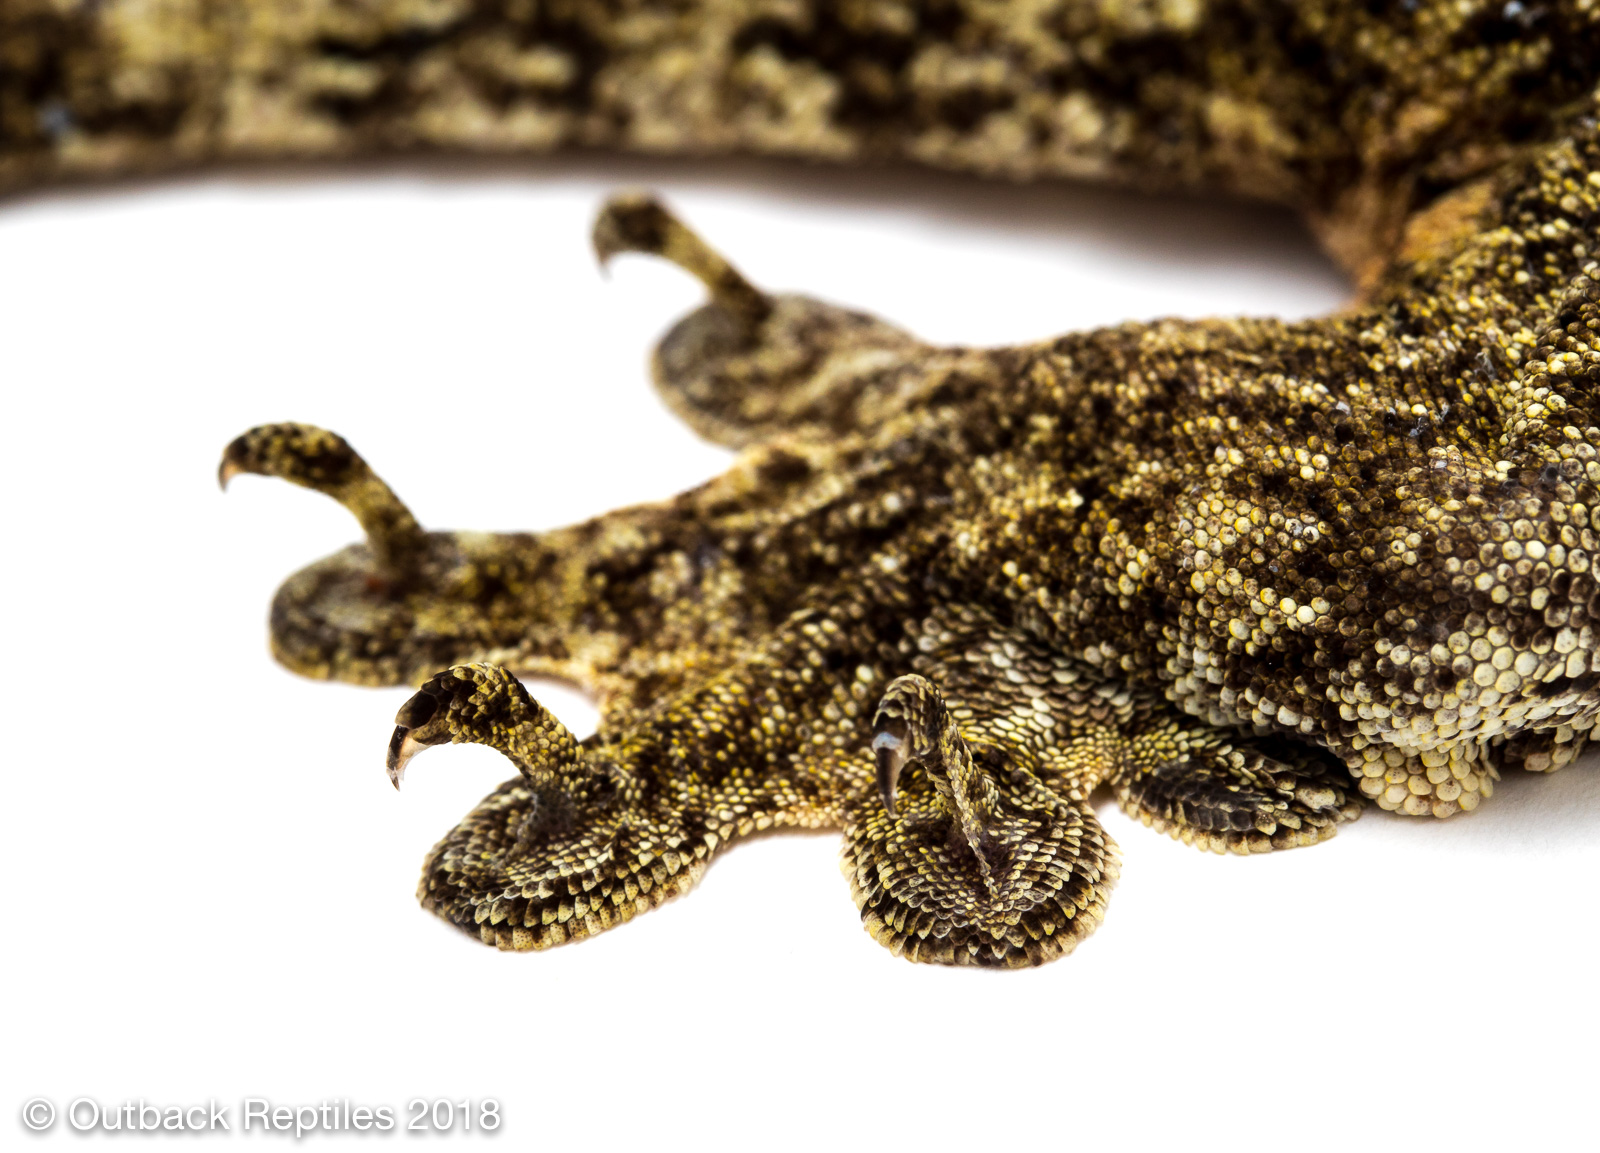 Vorax Gecko - Giant Halmahera Gecko - Gehyra marginata